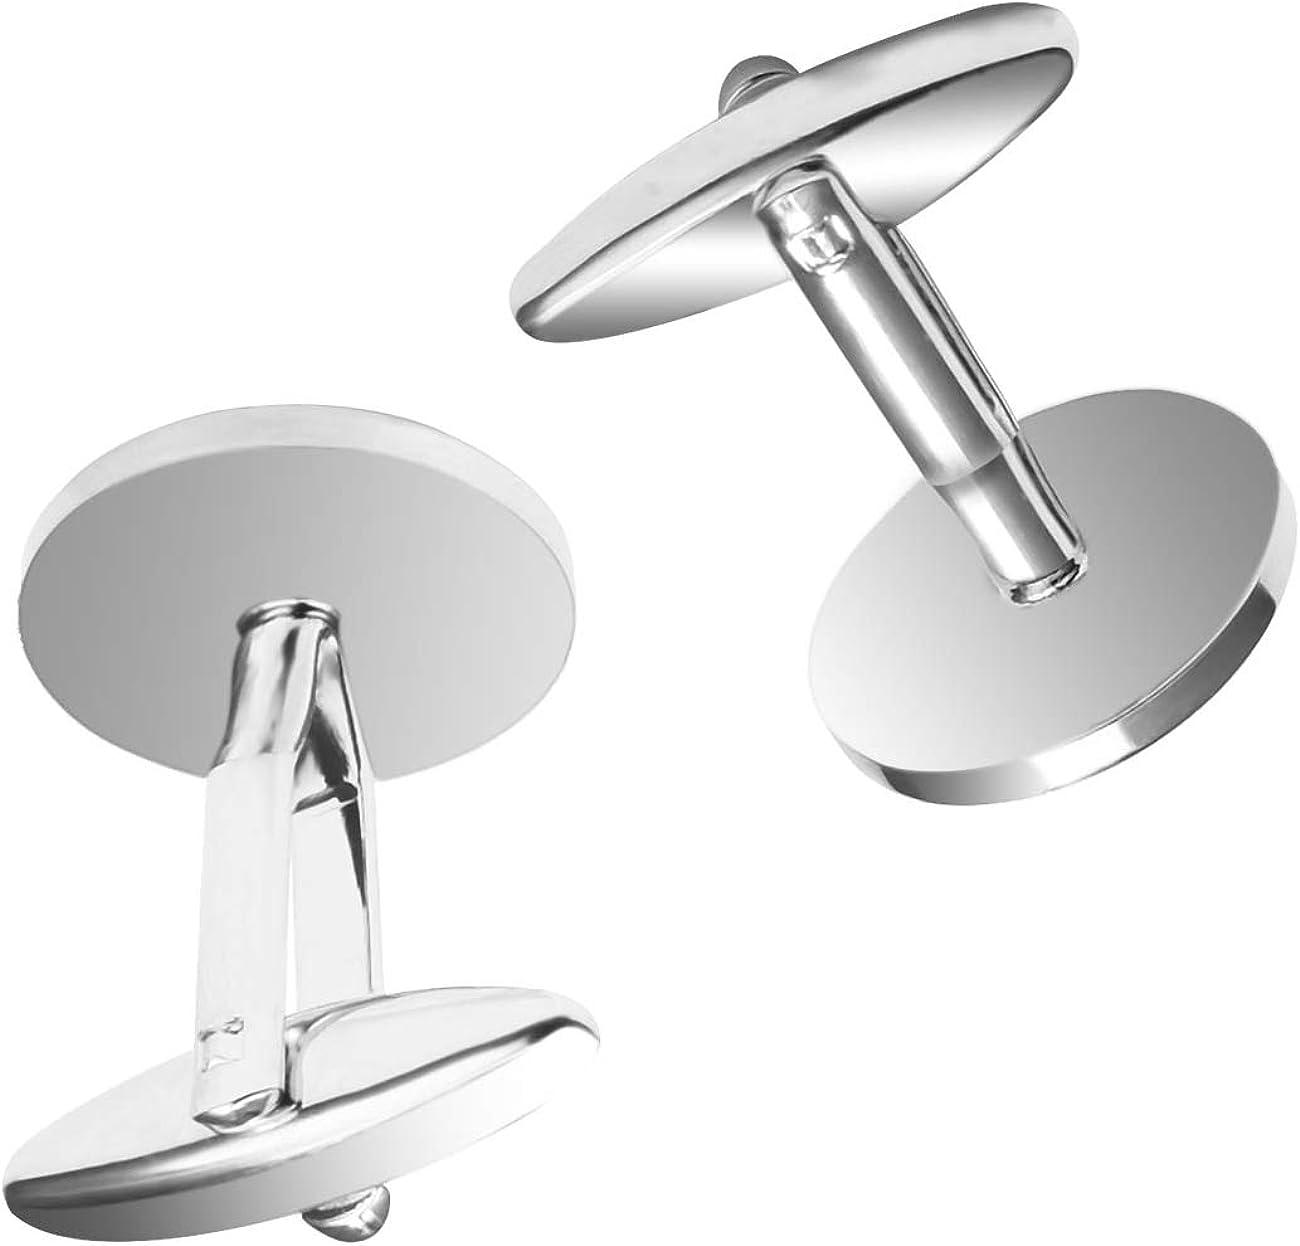 vogem Pearl Shell Cufflinks for Men Silver Tone Round Stainless Steel Business Wedding Shirt Cufflinks